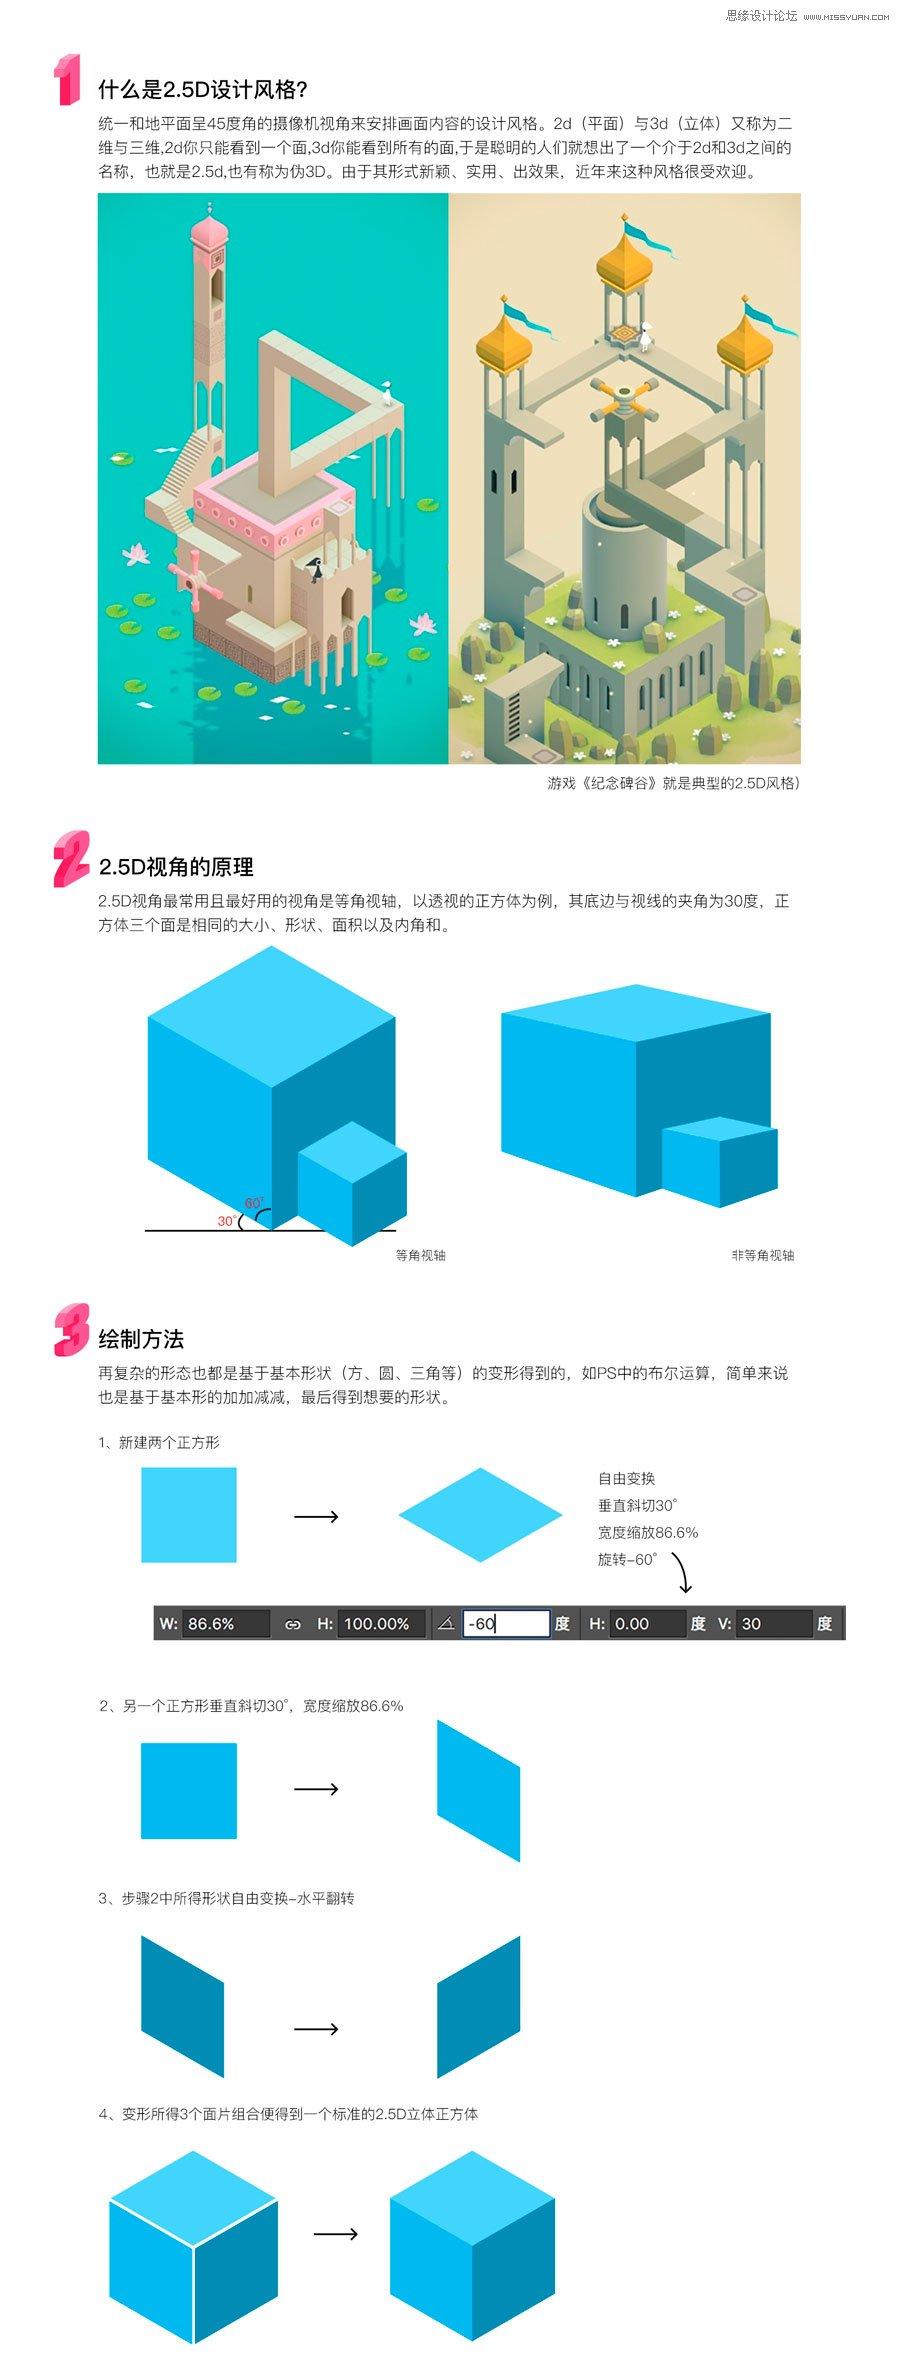 Photoshop制作2.5D风格城堡教程,PS教程,思缘教程网